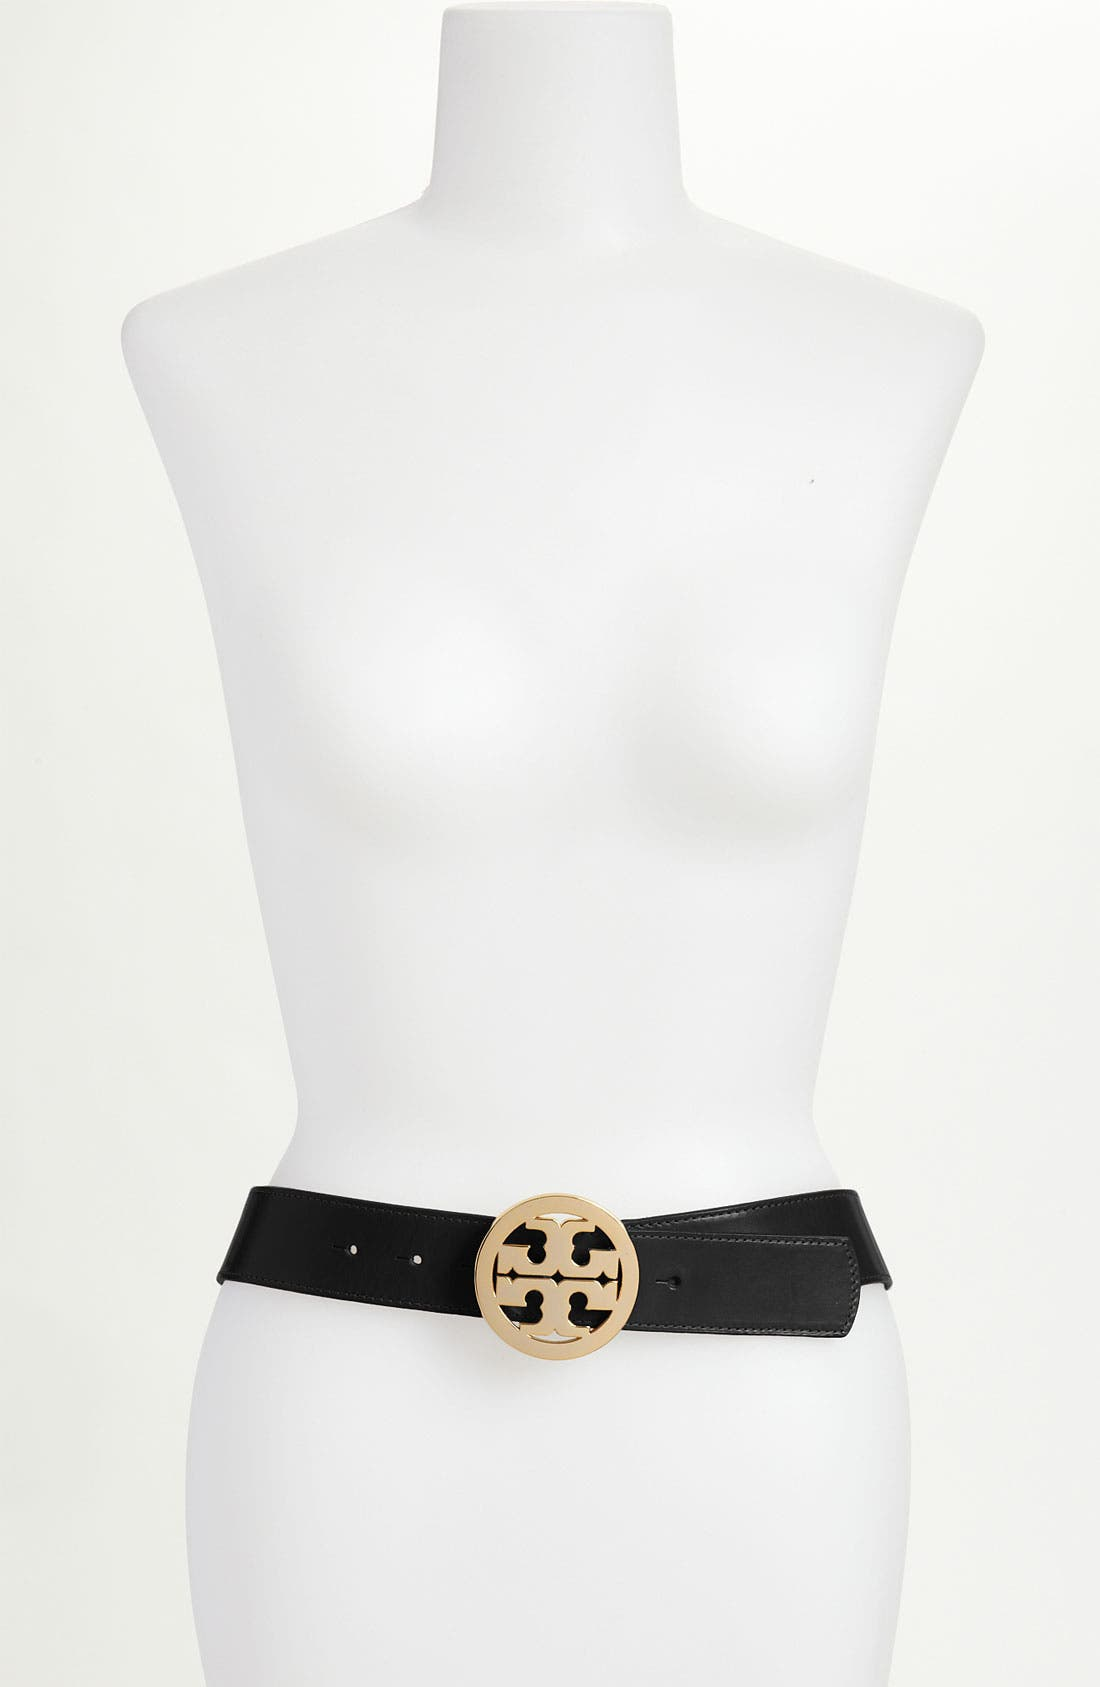 Alternate Image 1 Selected - Tory Burch 'Logo' Glazed Leather Belt